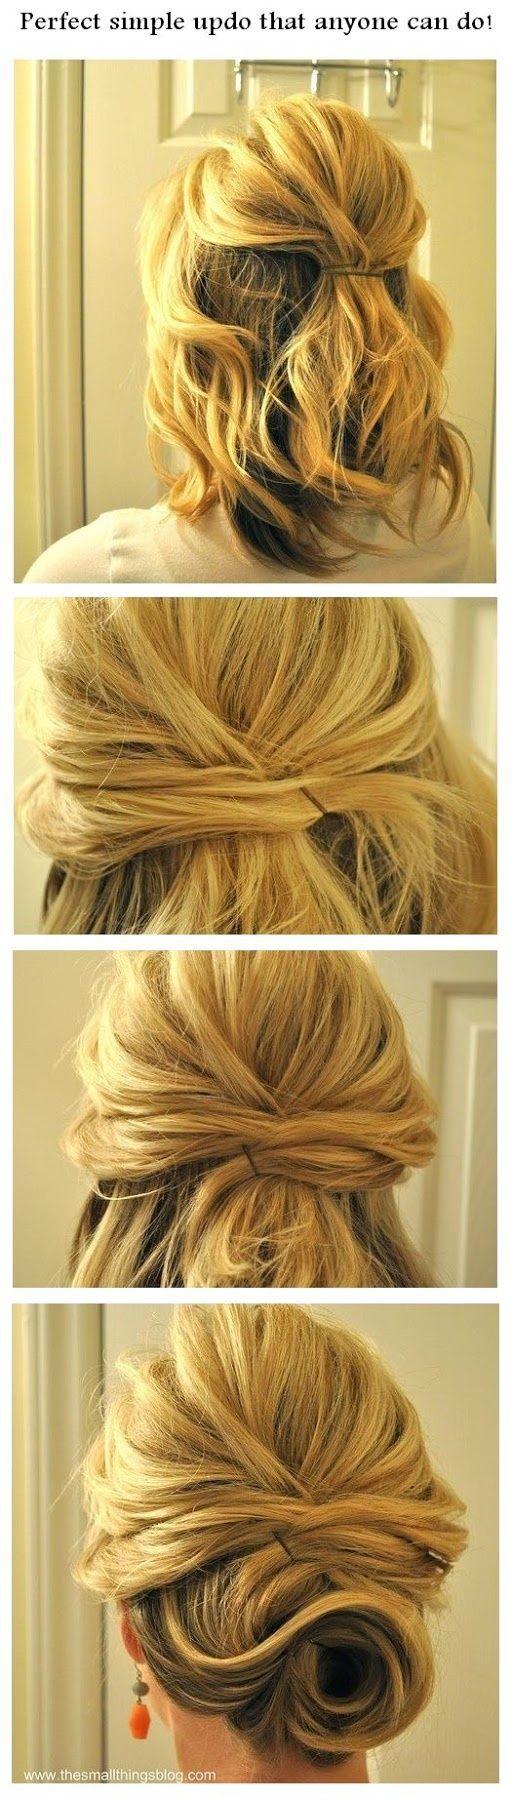 updo  for lob  hair tricks Hair Short hair updo  Updo